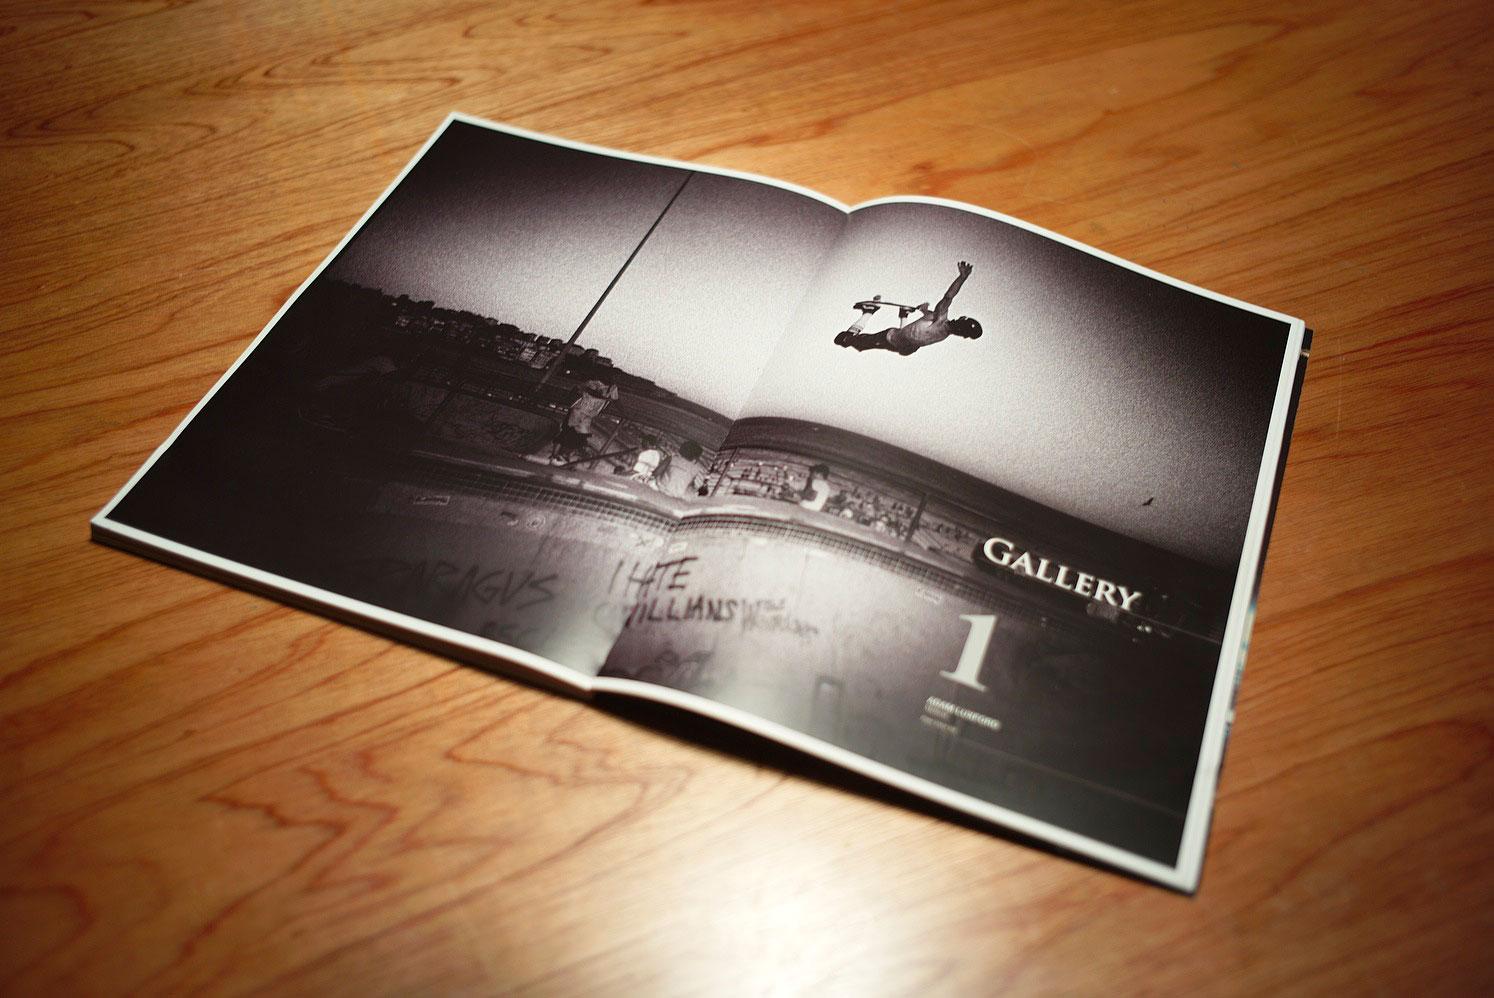 Tristan_Still_The_Skateboarders_Journal_Issue_5_Gallery_Feature_Image_Bondi.jpg